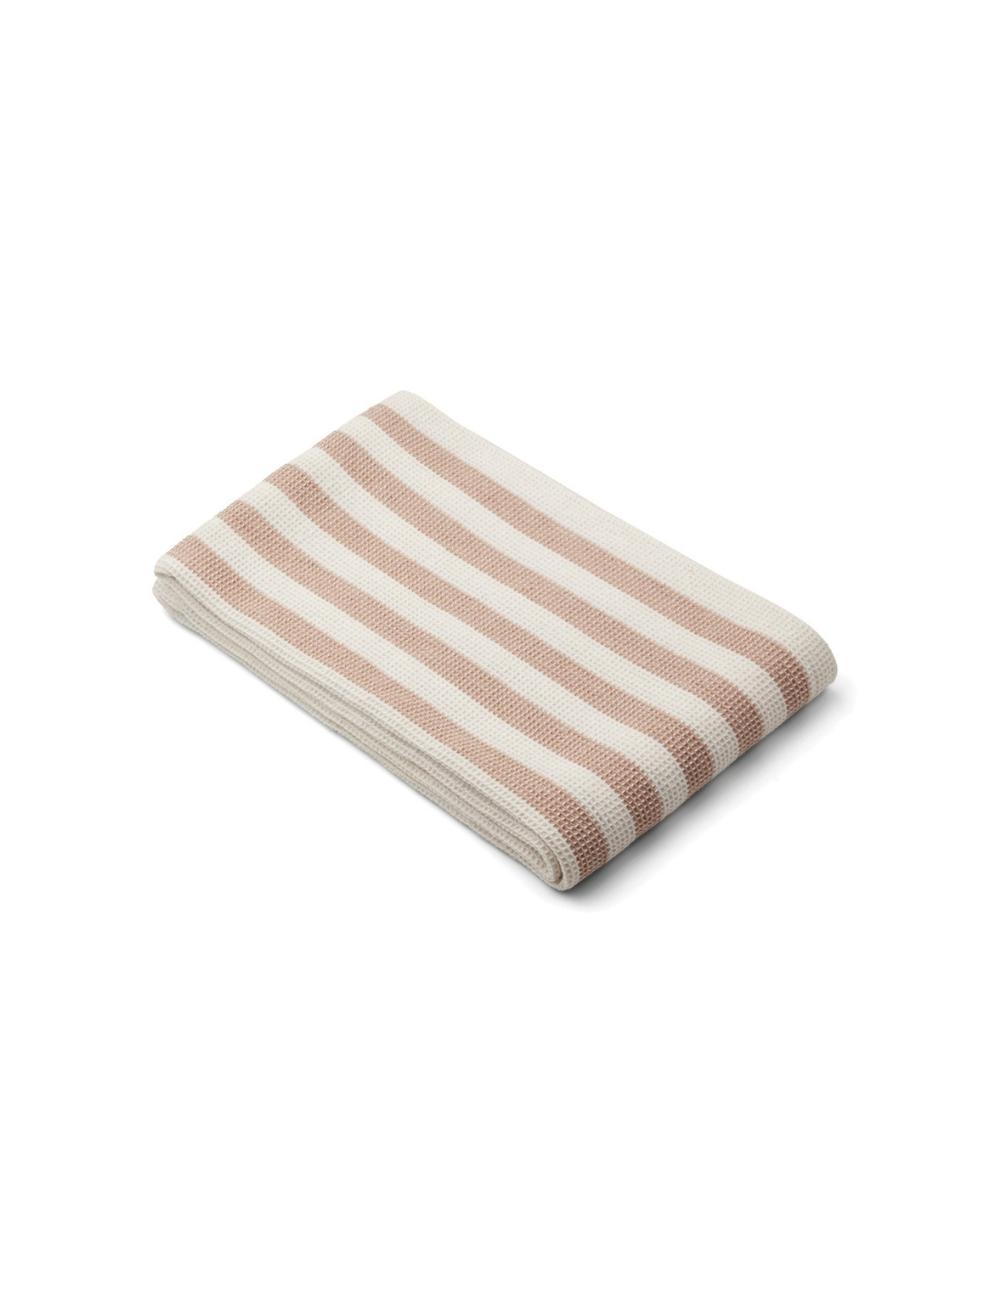 Macy Beach Towel Light Pale Tuscany/Creme de la Creme